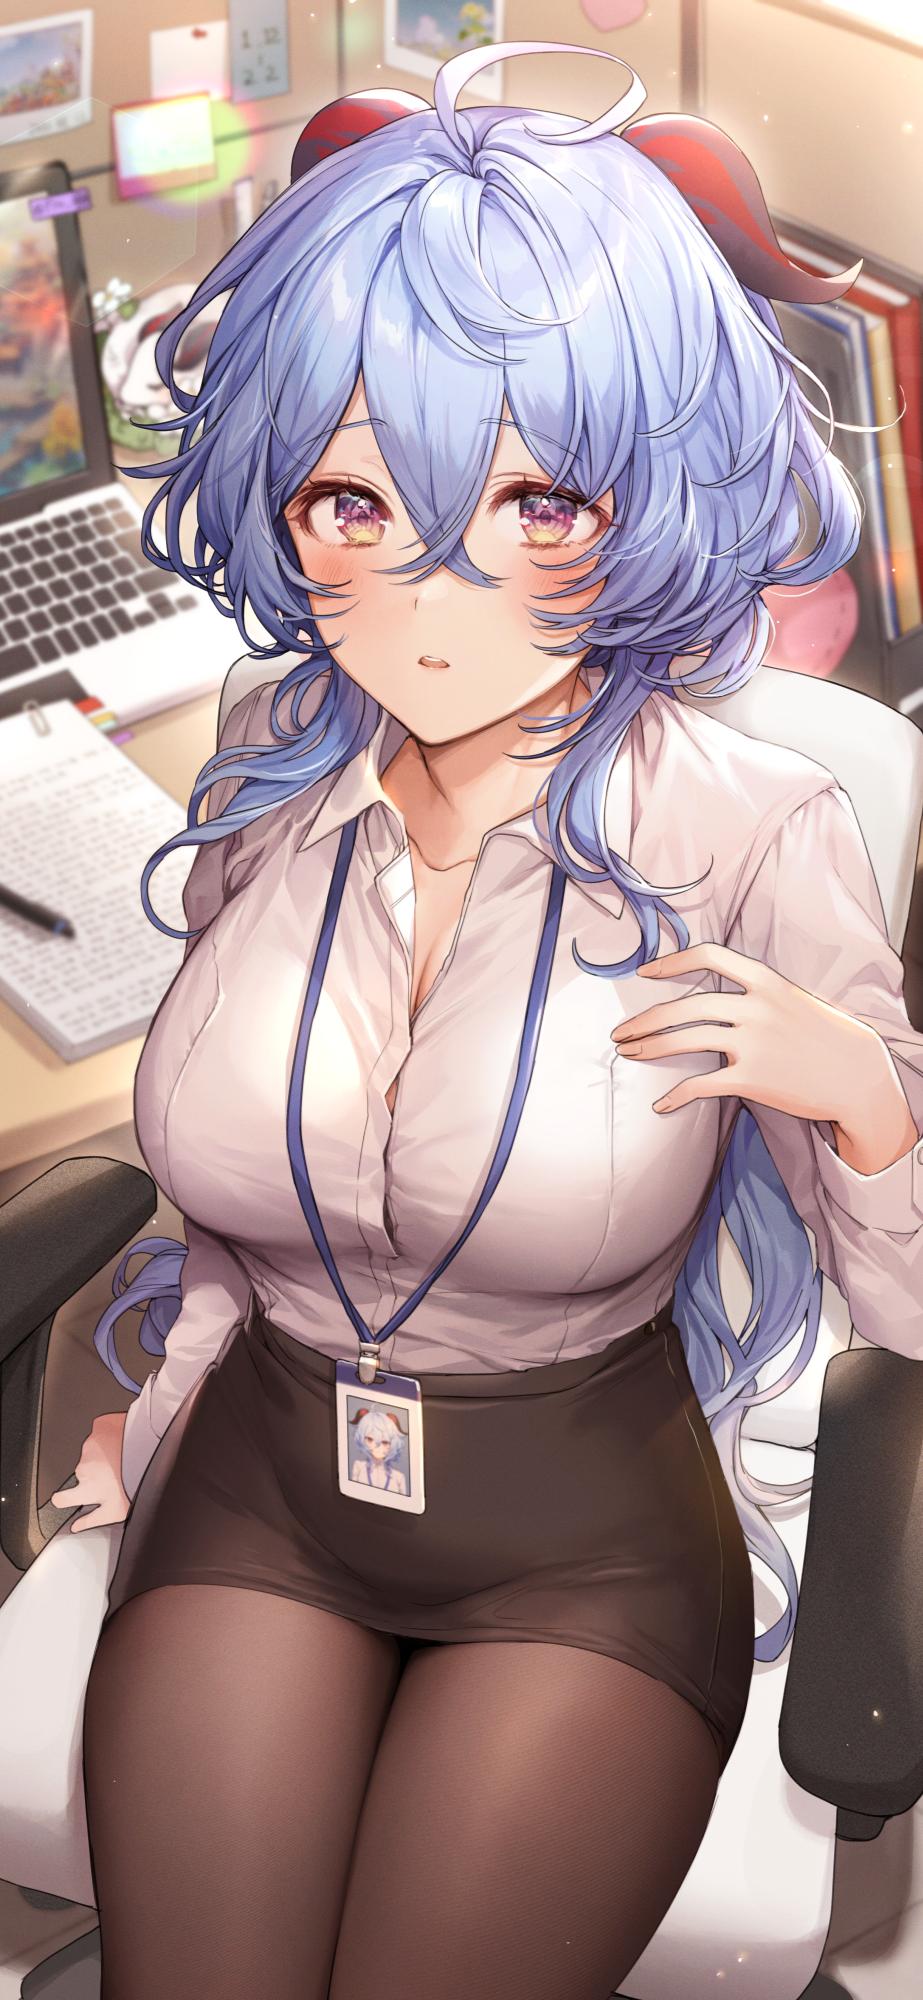 Anime 923x2000 anime girls anime Pillo artwork Genshin Impact Ganyu (Genshin Impact) horns blue hair office girl pantyhose big boobs women